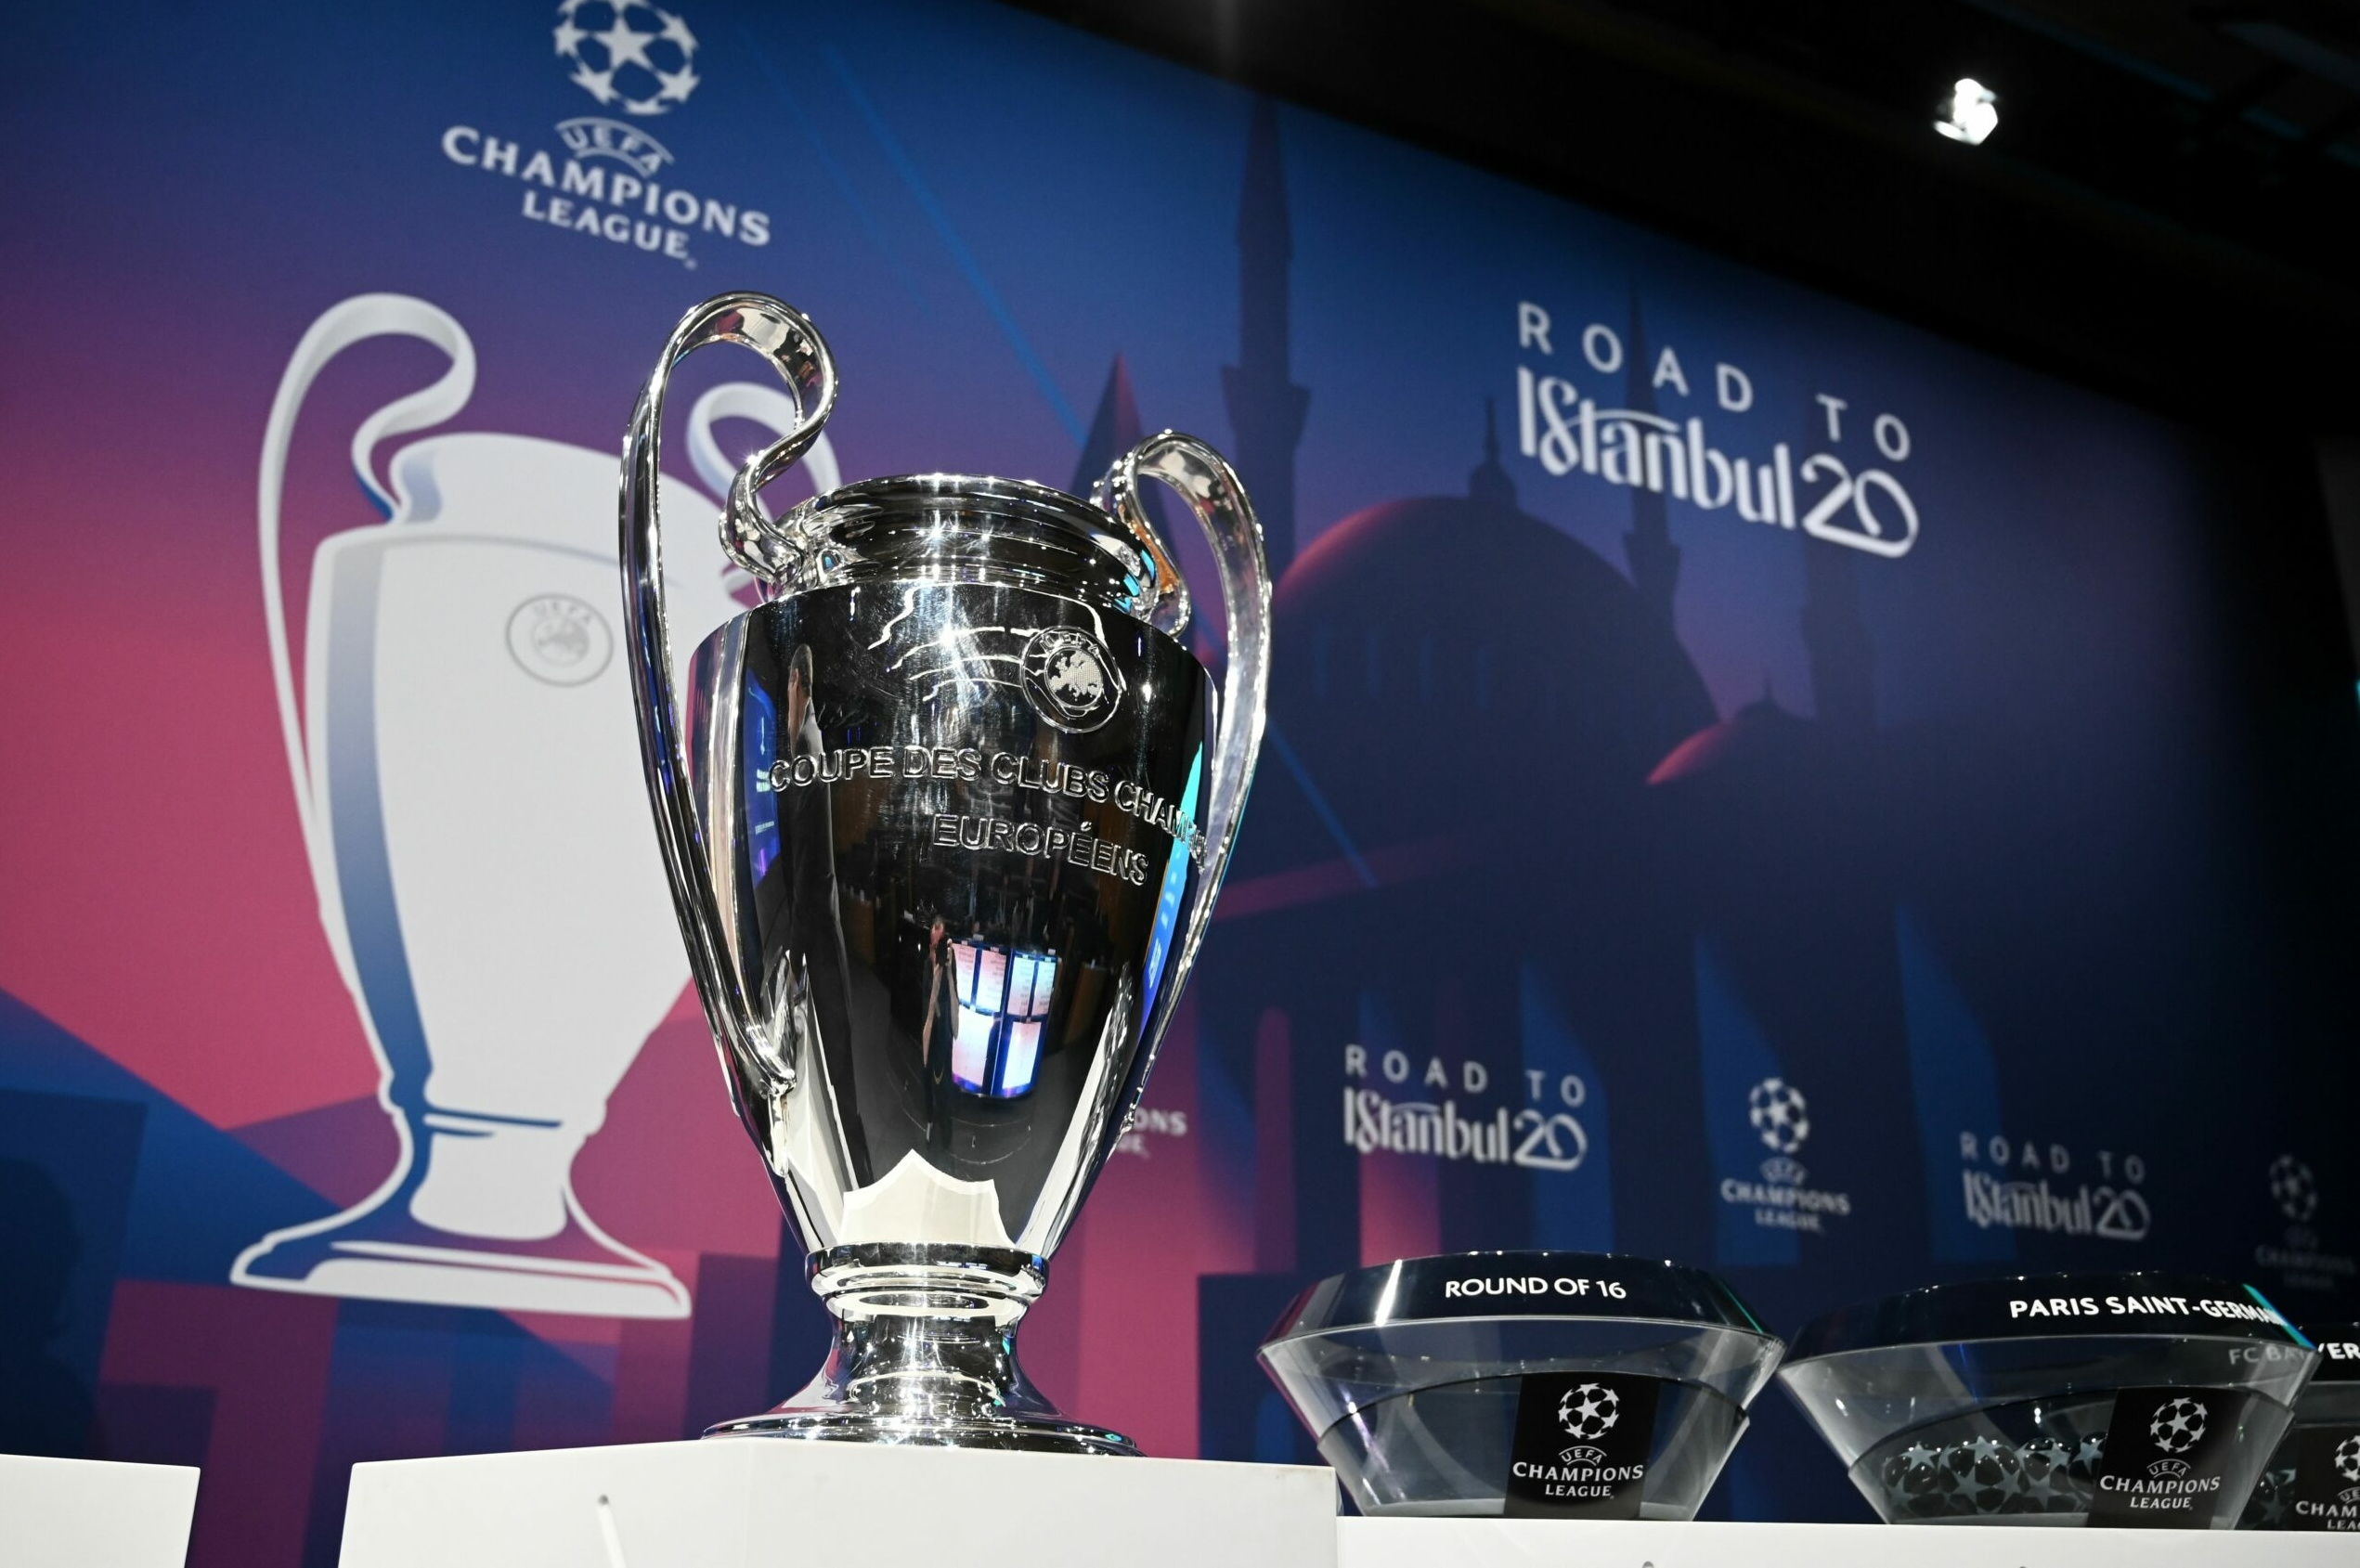 Champions League: Δυο μεγάλα ζευγάρια στον δρόμο για την Πόλη!